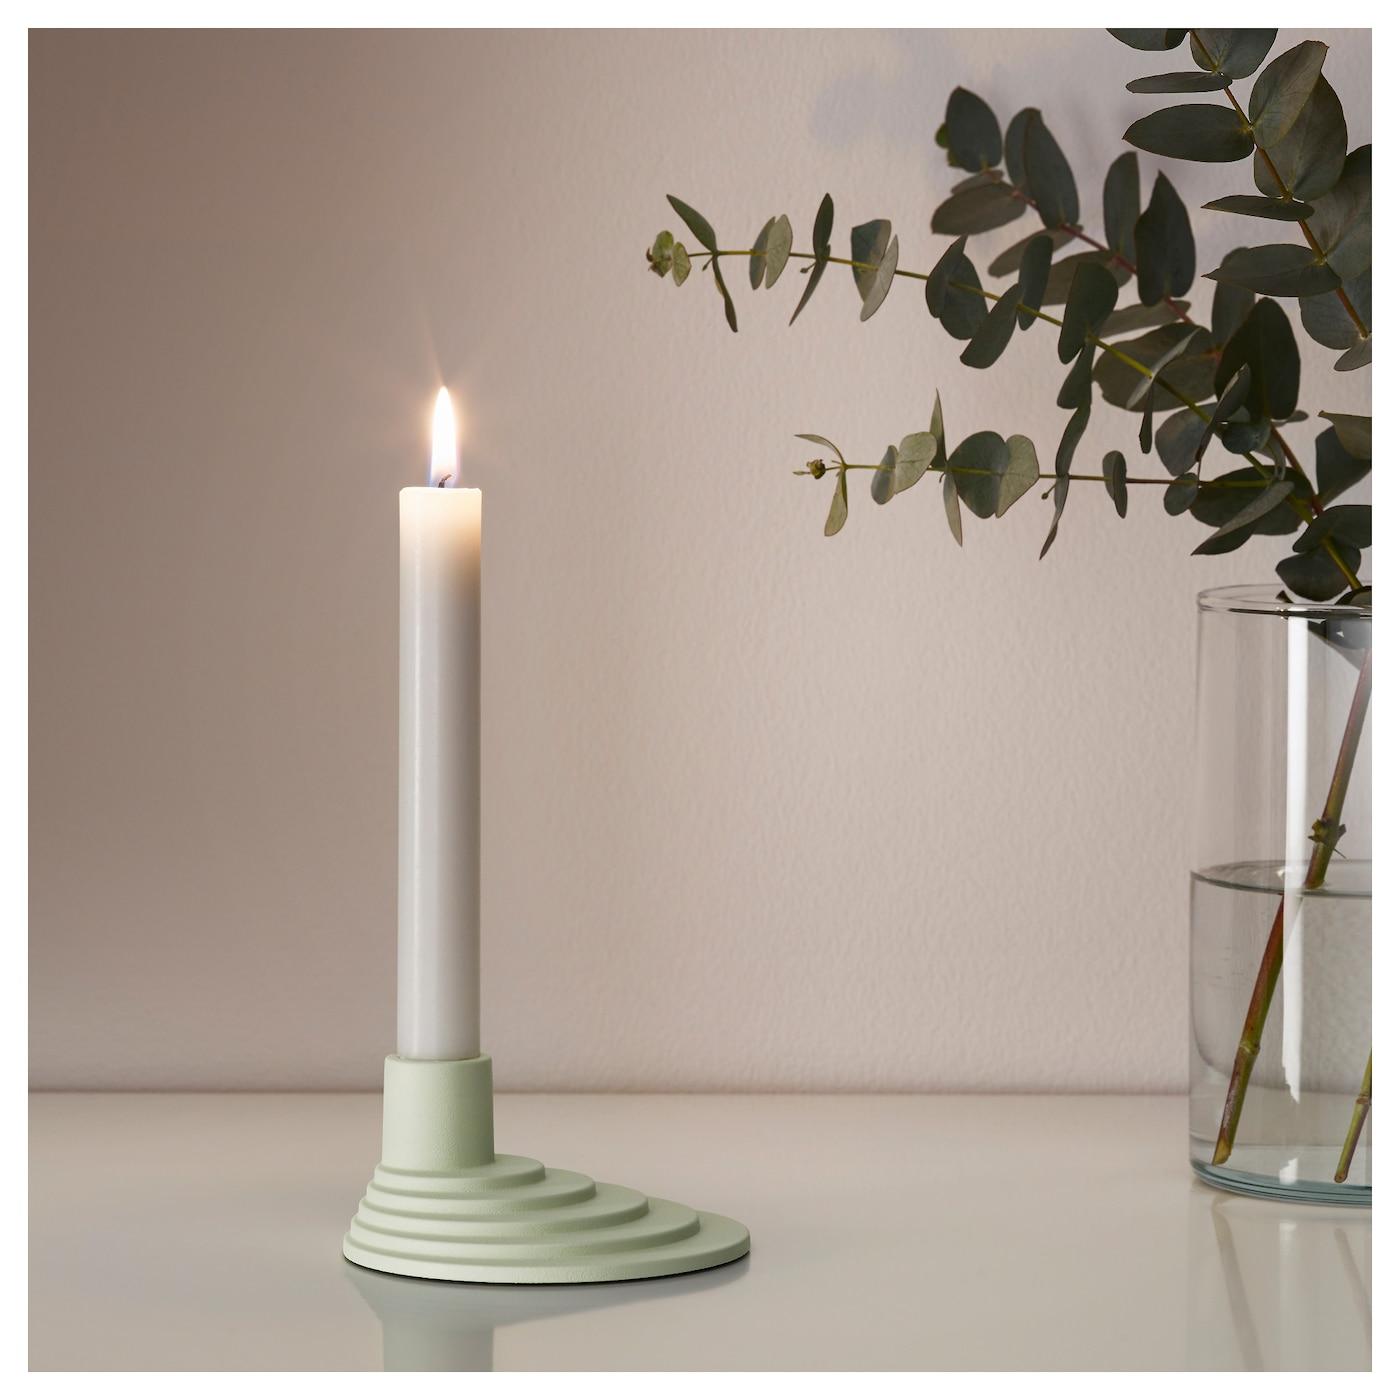 ypperlig bougeoir vert clair 5 cm ikea. Black Bedroom Furniture Sets. Home Design Ideas